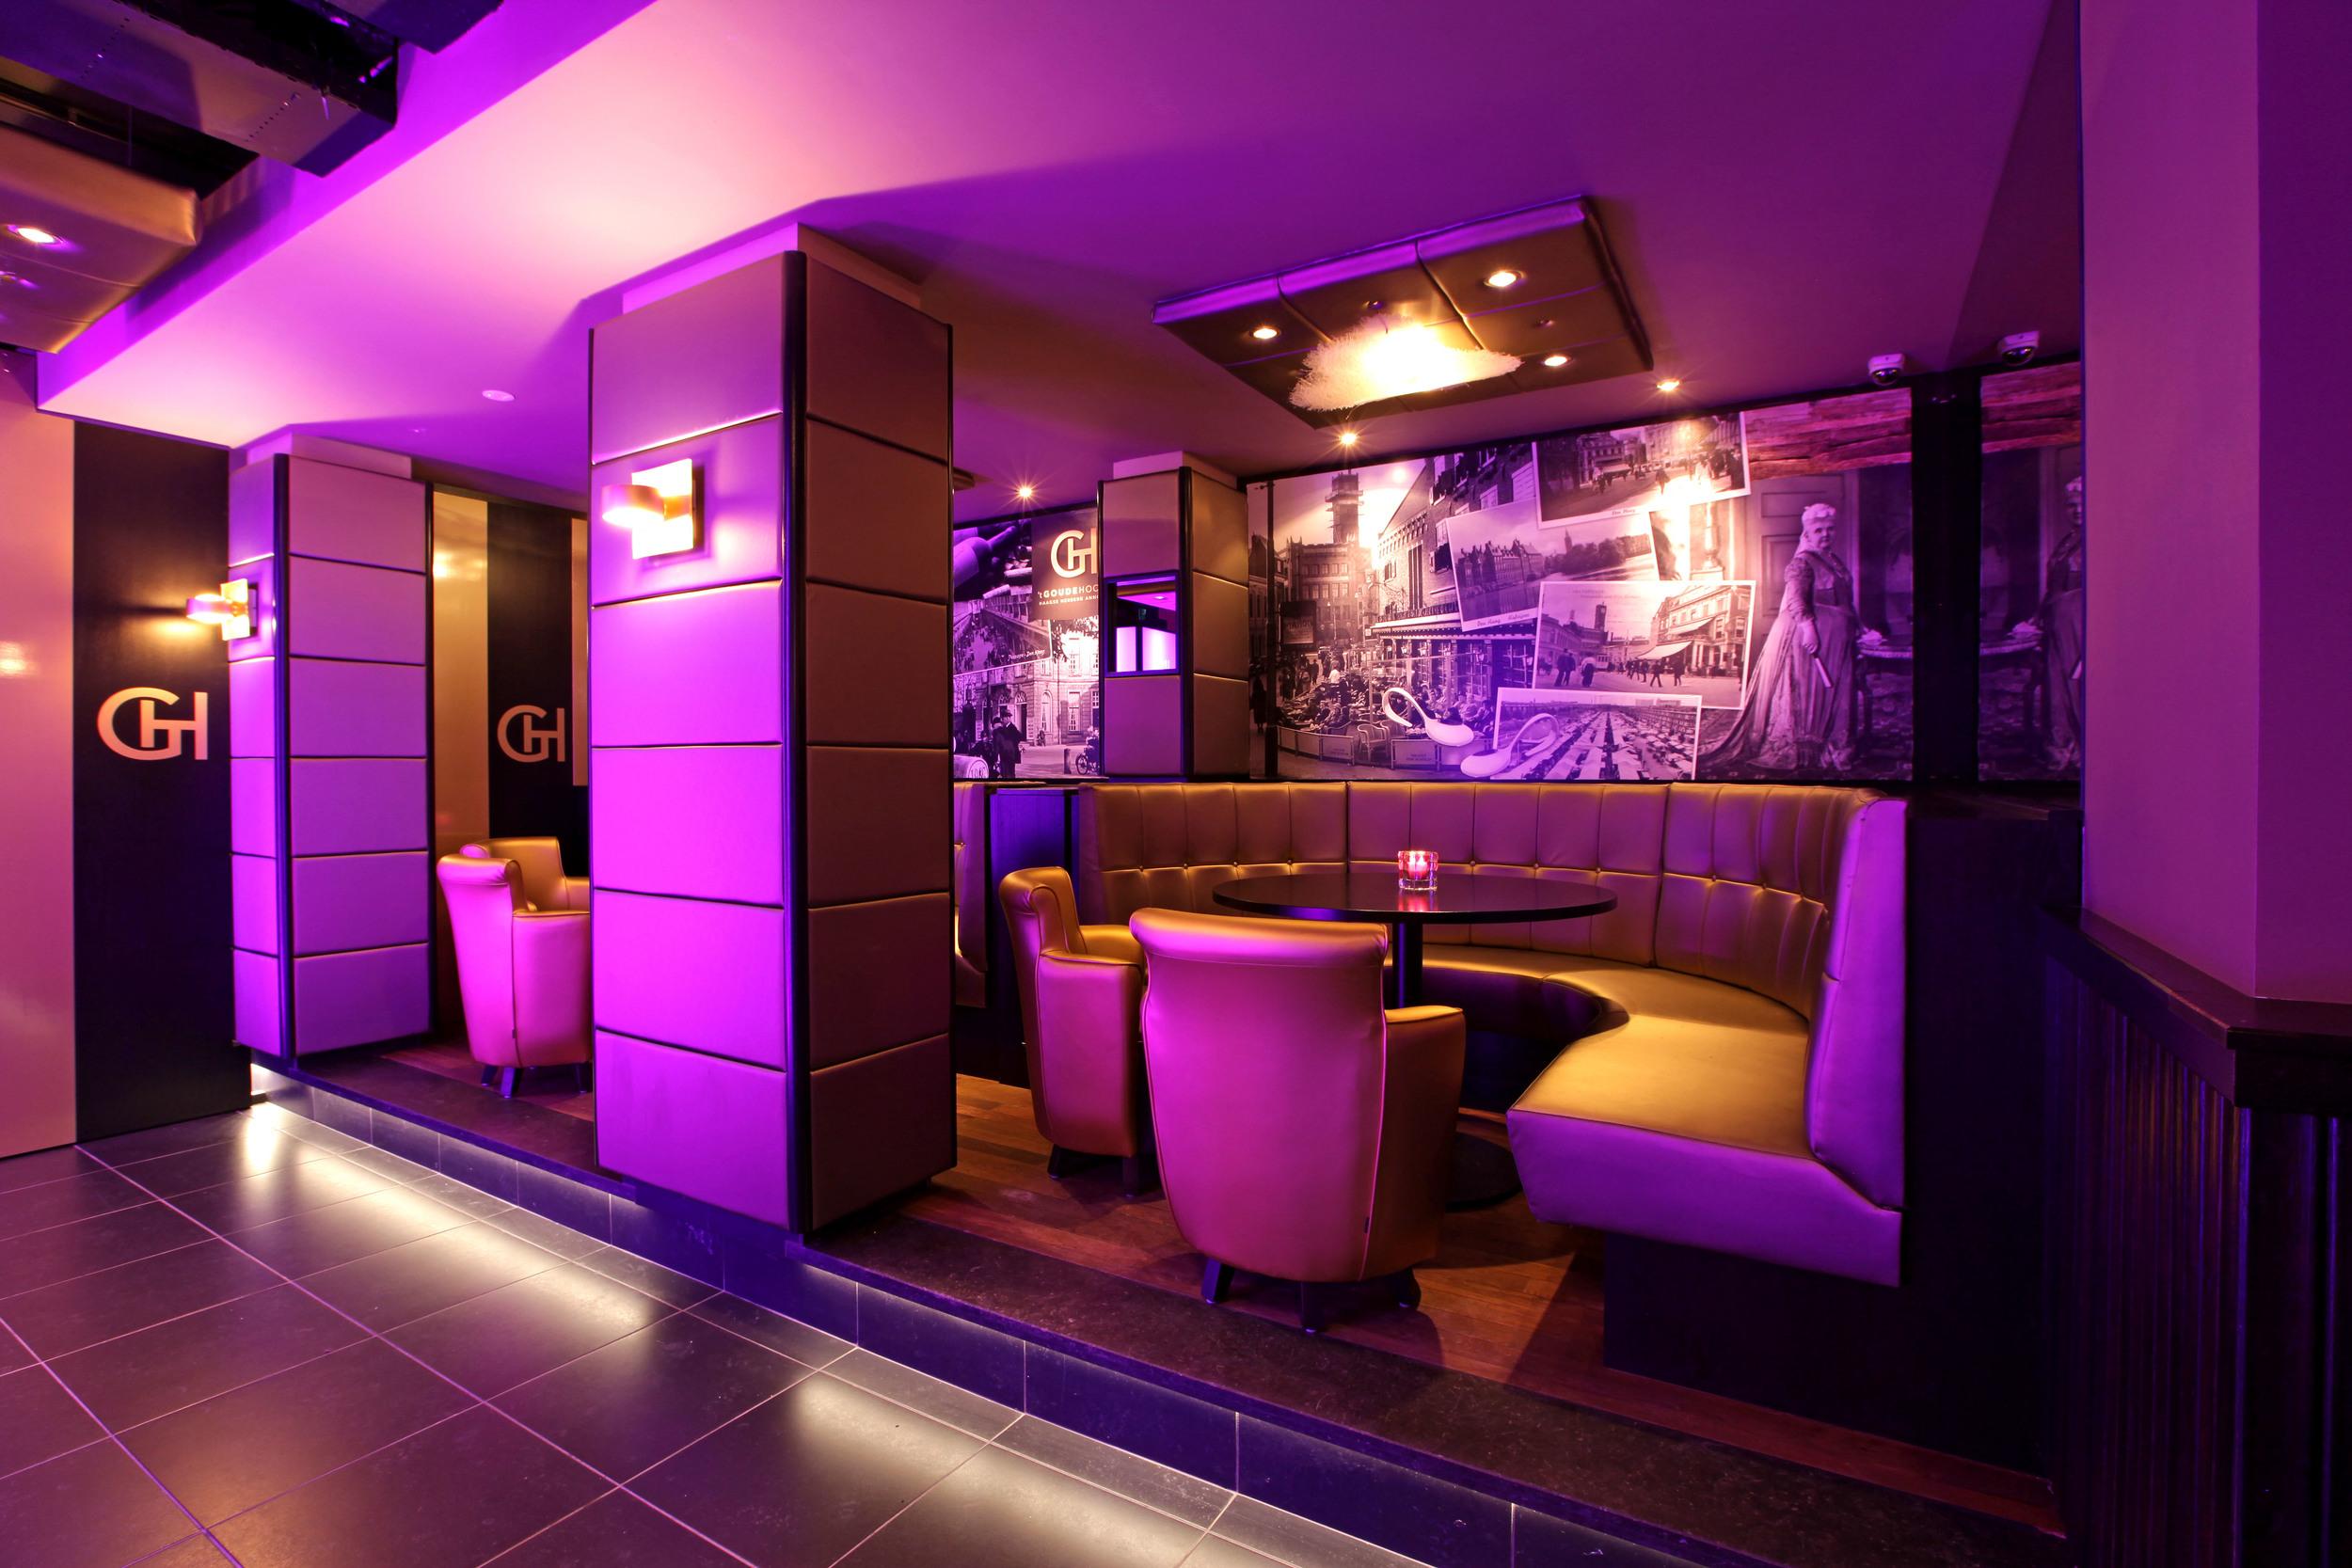 Hotel Restaurant 't Goude Hooft Den Haag-9.jpg